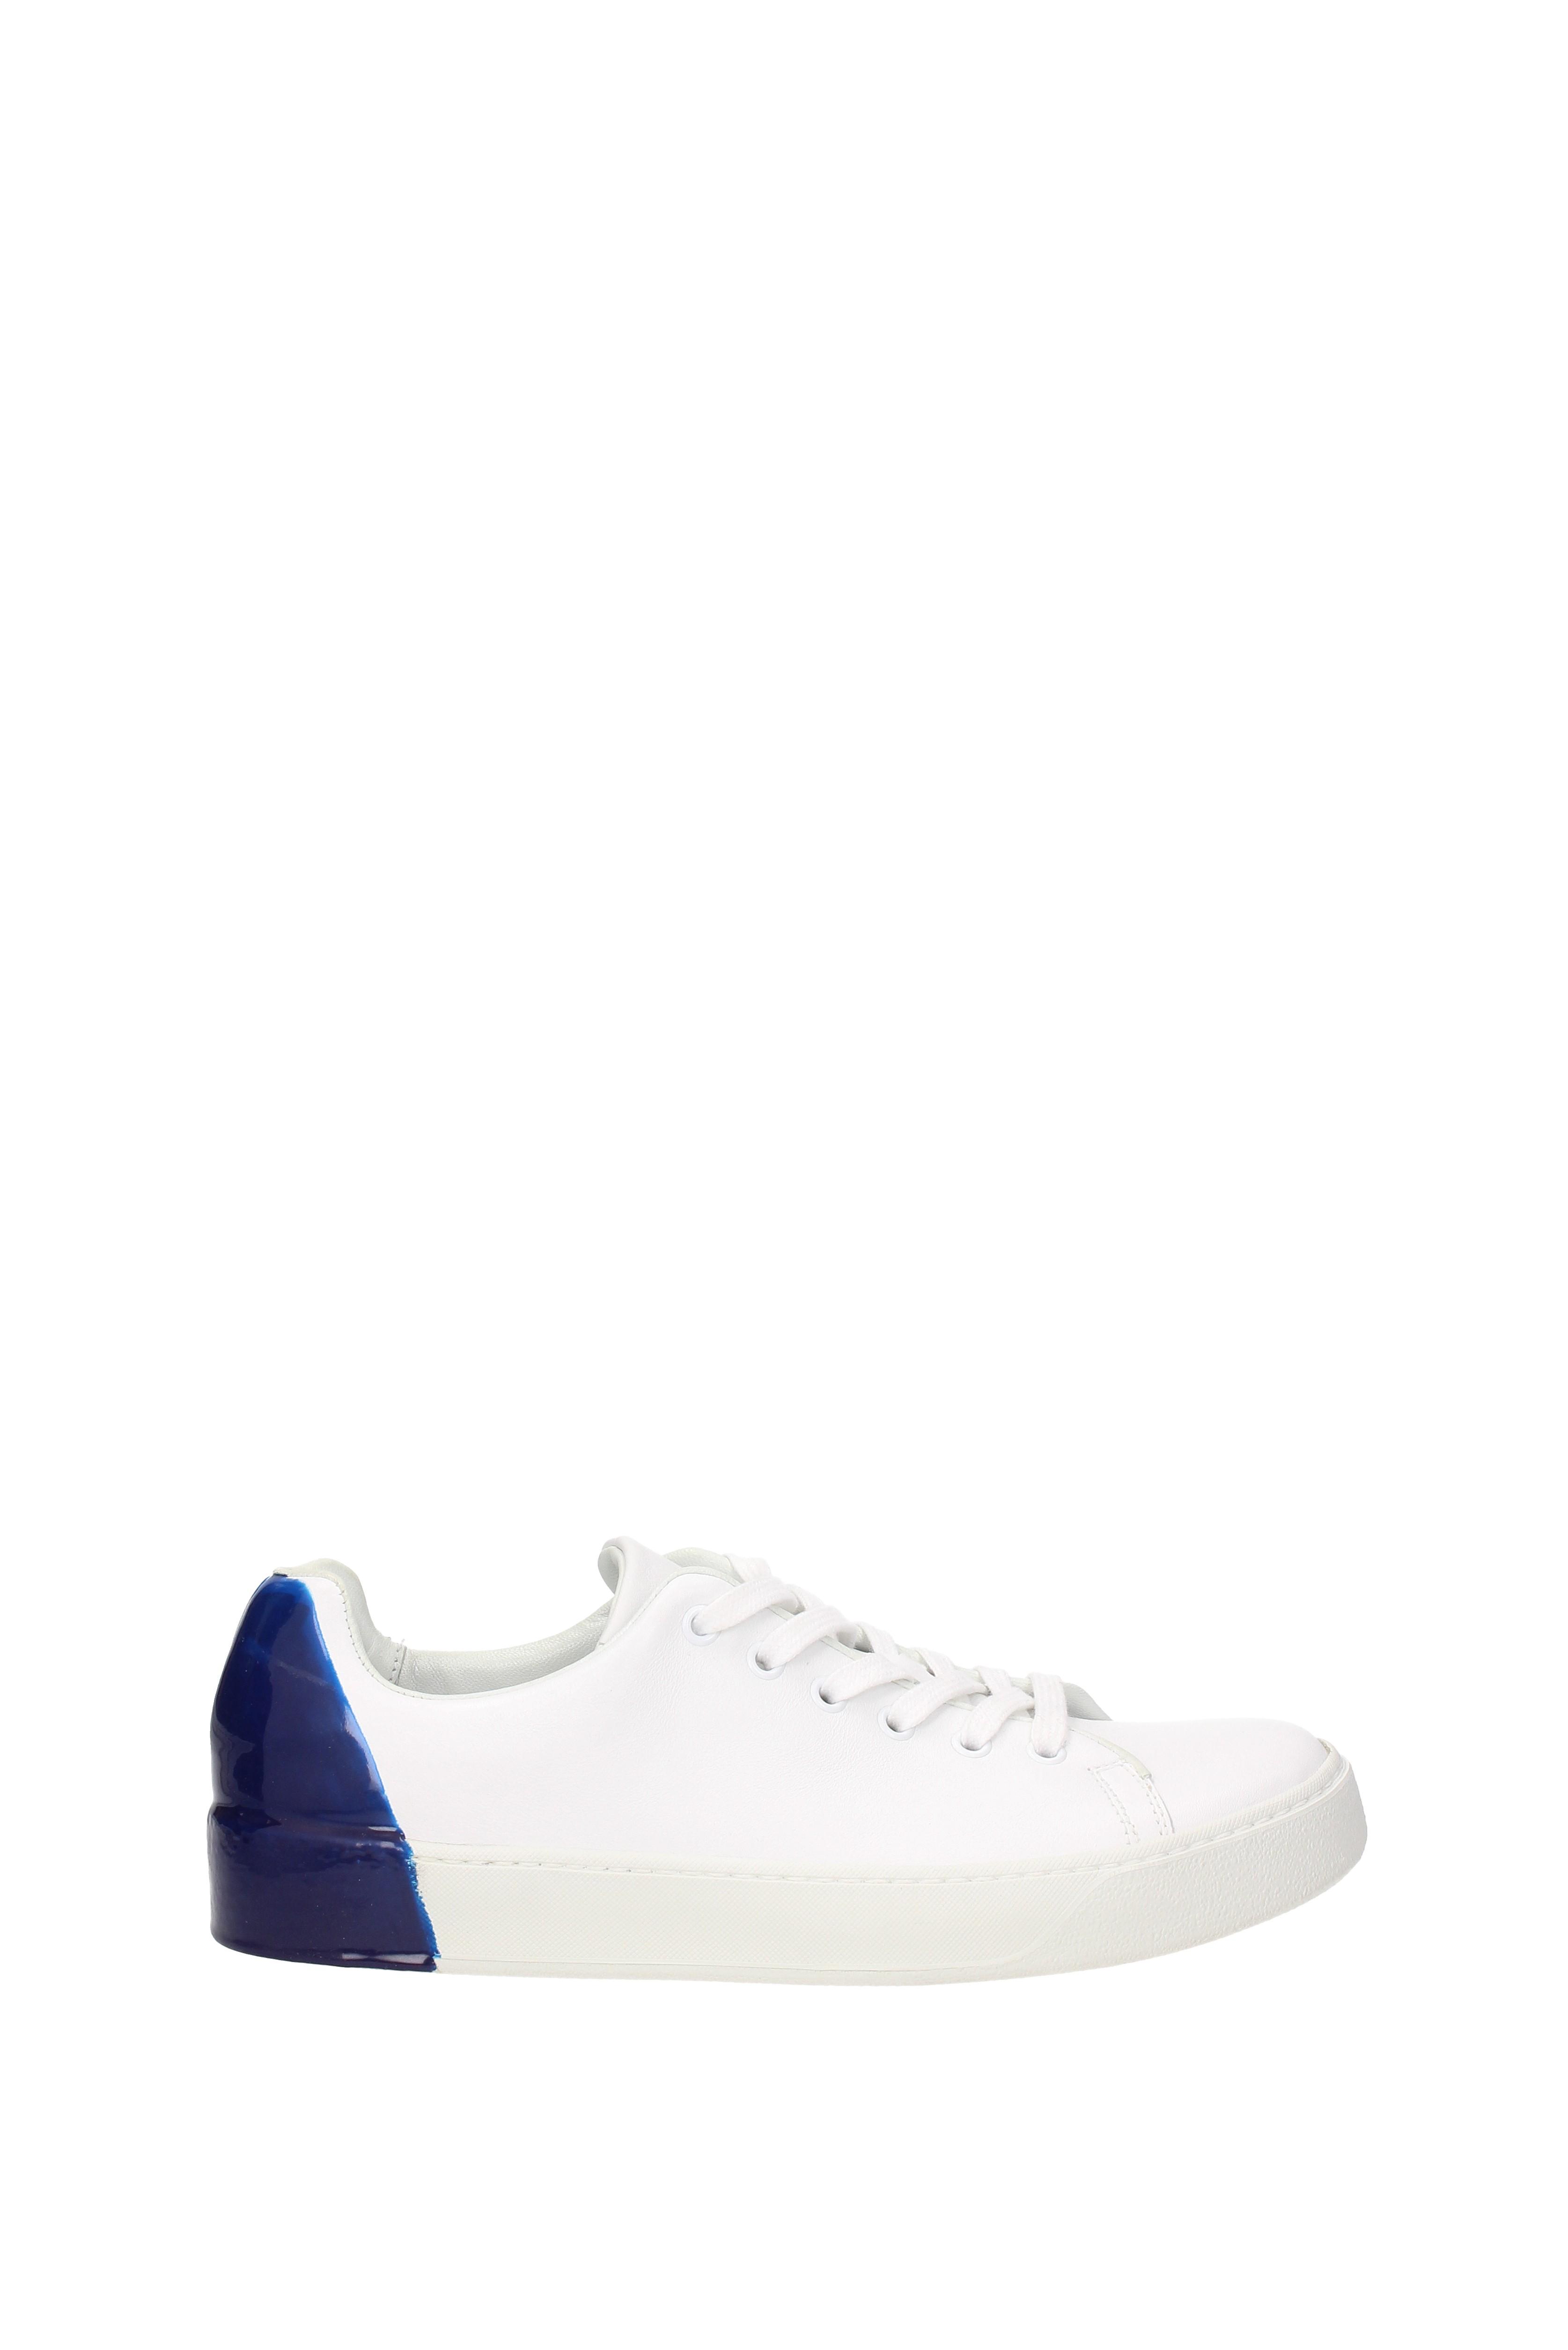 Sneakers Premiata Premiata Premiata polo Herren - Leder (31036POLO) a58ce6